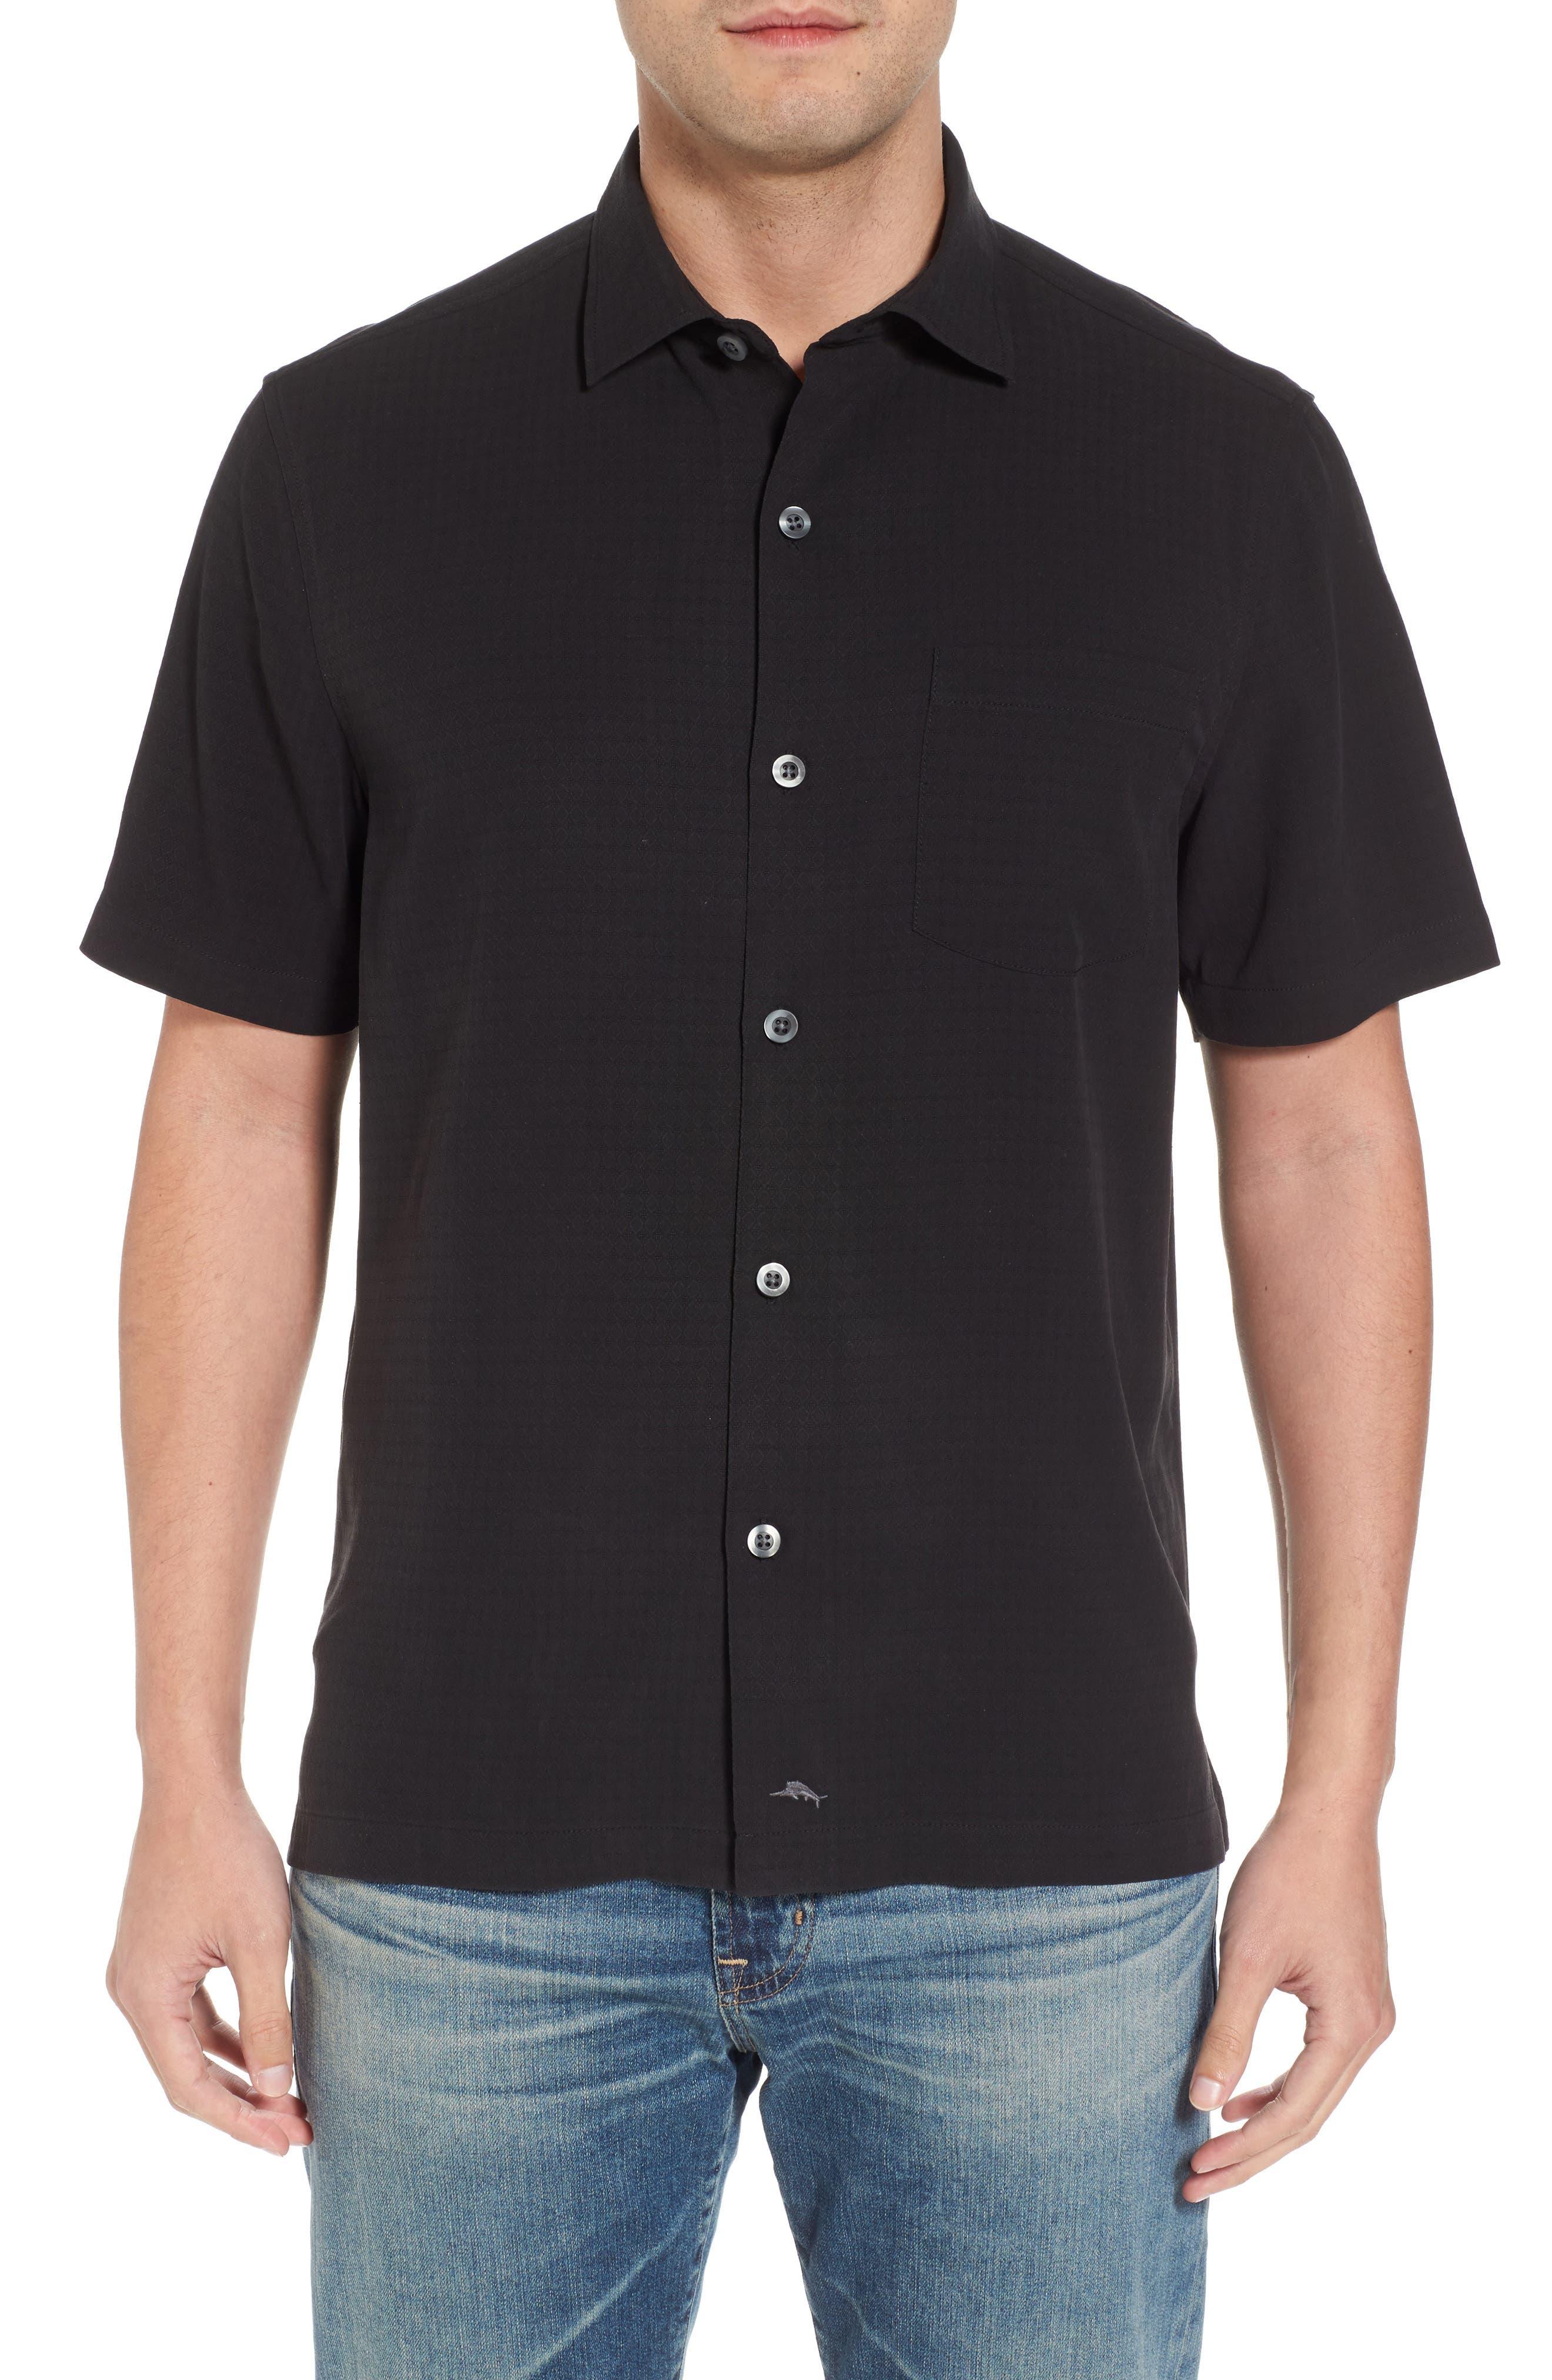 Oasis Jacquard Silk Sport Shirt,                         Main,                         color, 001